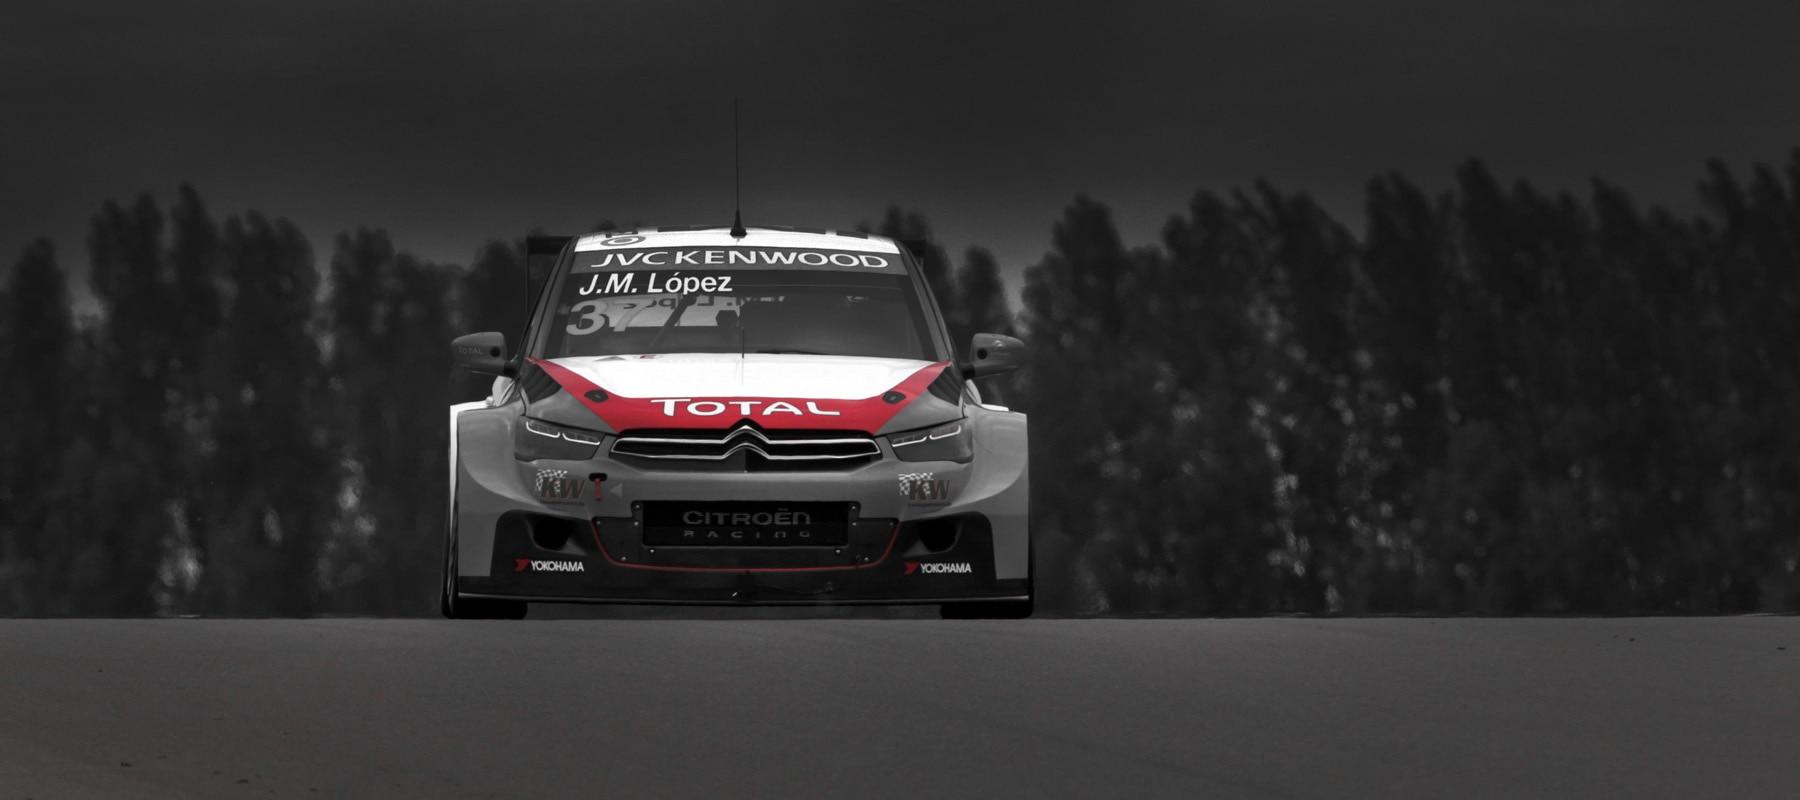 FIA WORLD TOURING CAR CHAMPIONSHIP 2014 – SLOVAKIA